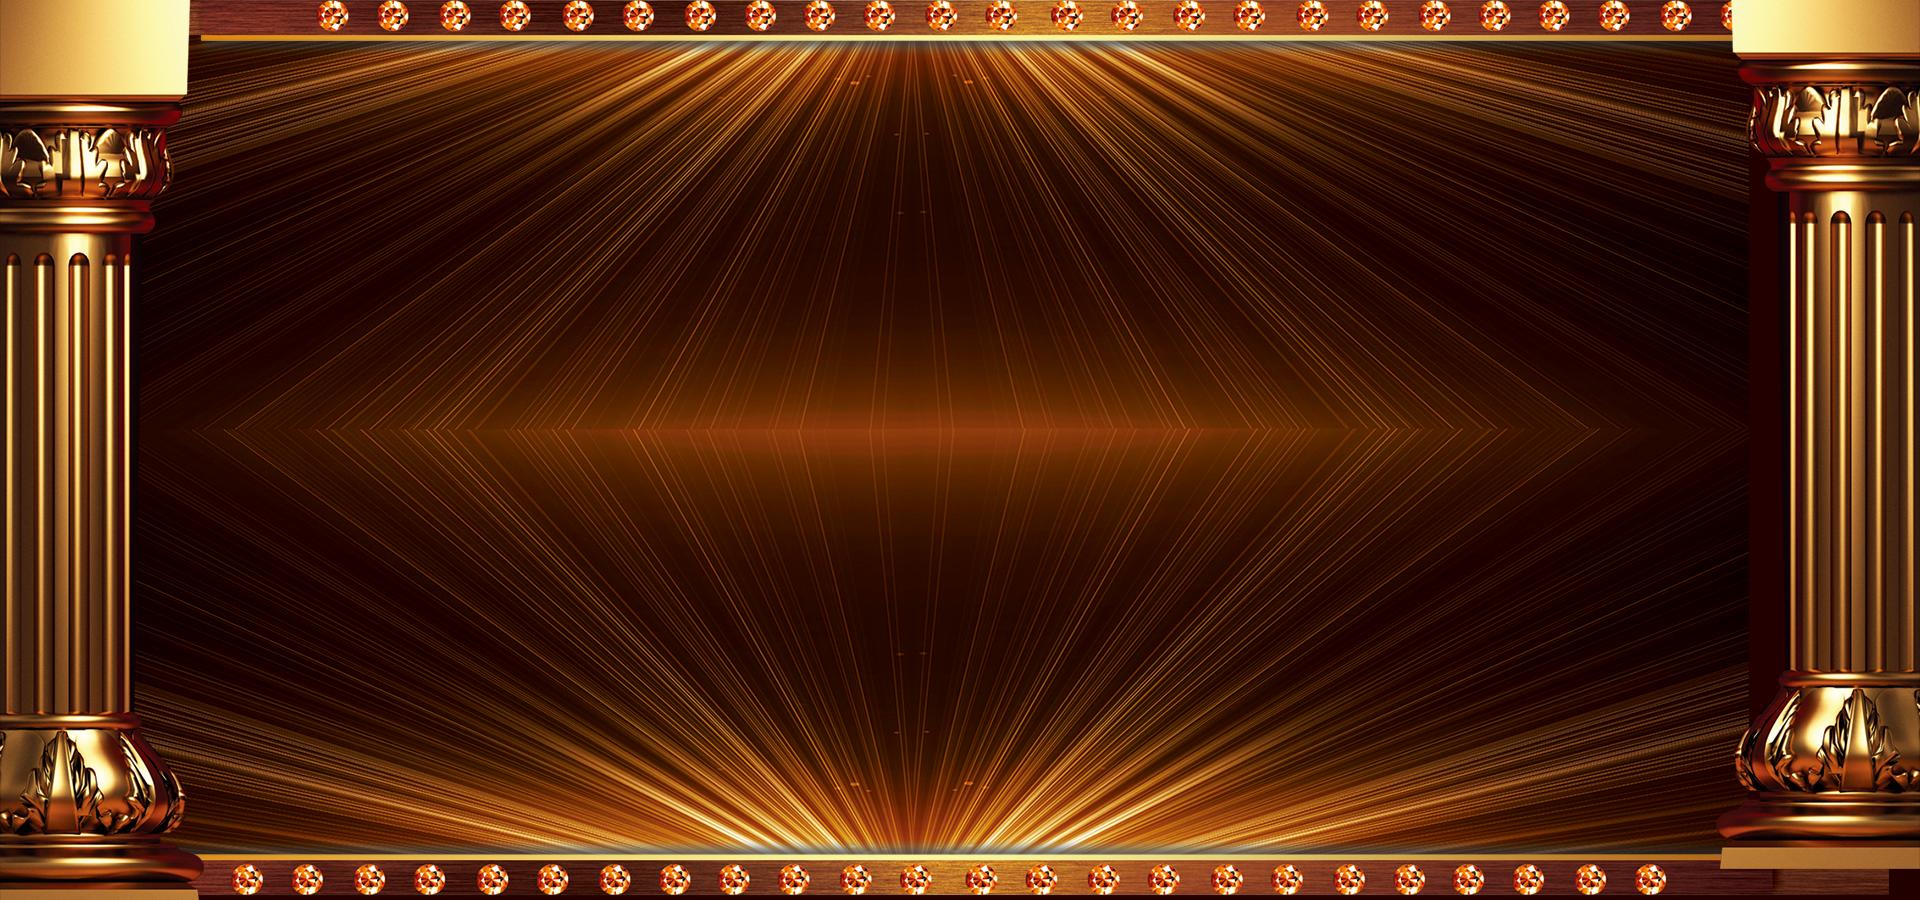 Tyrant Gold Background Light Background Images Gold Background Wedding Background Images